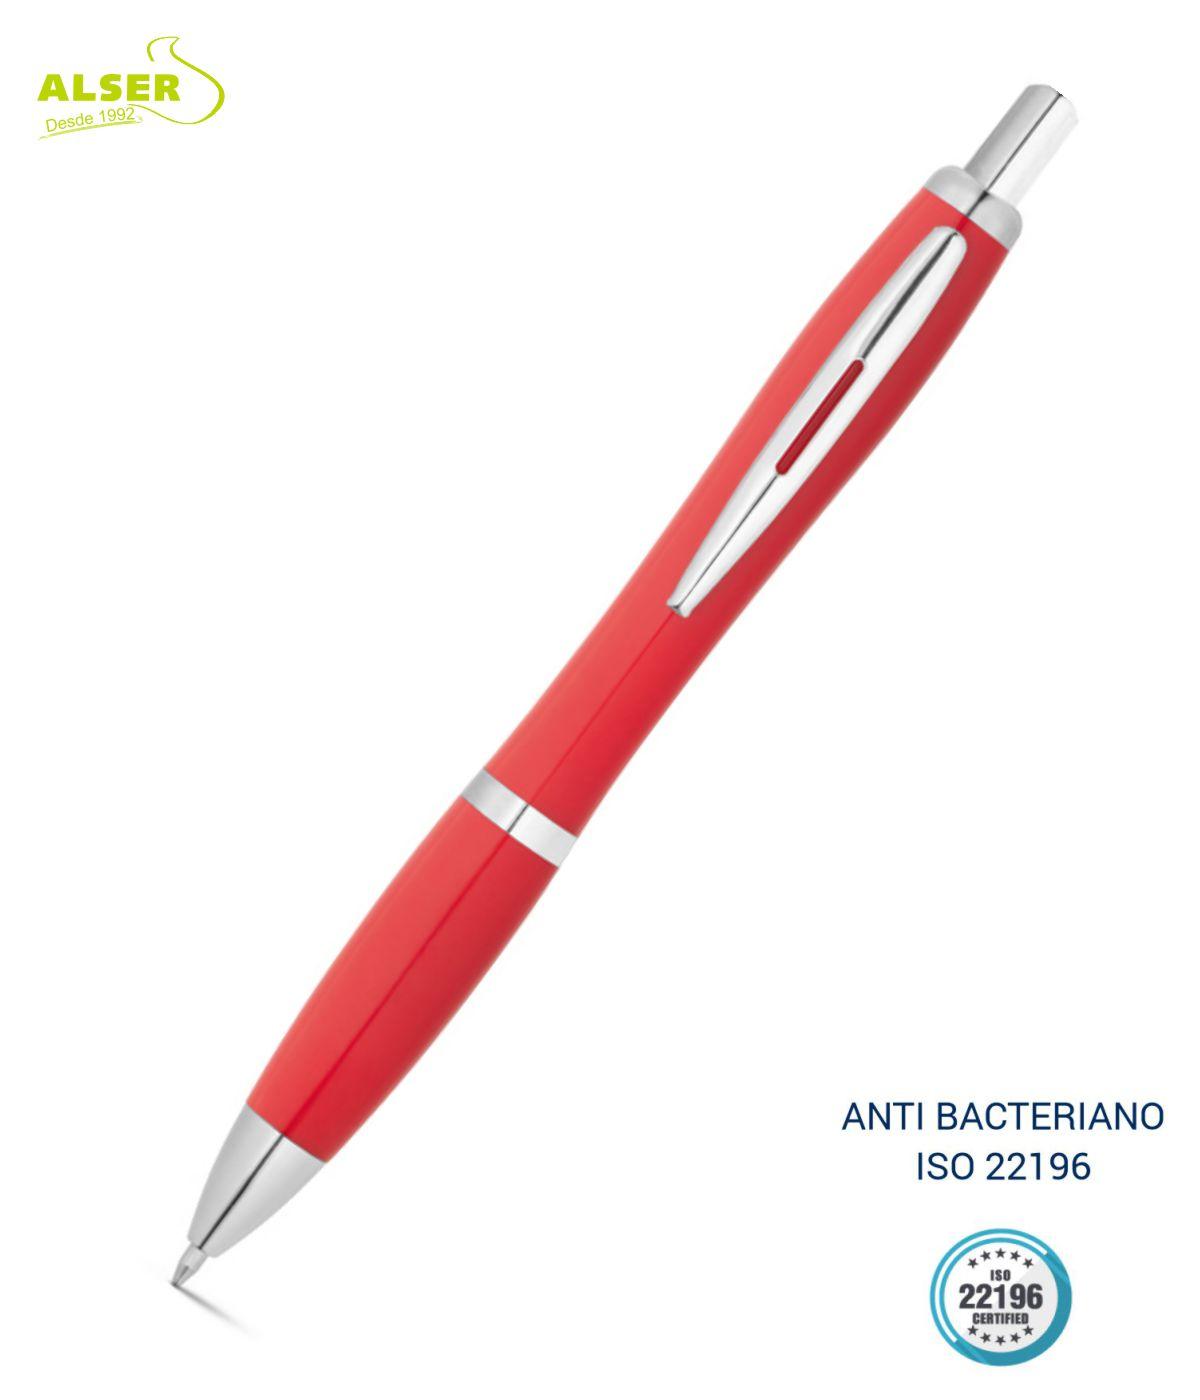 Boligrafo anti bacteriano Rojo